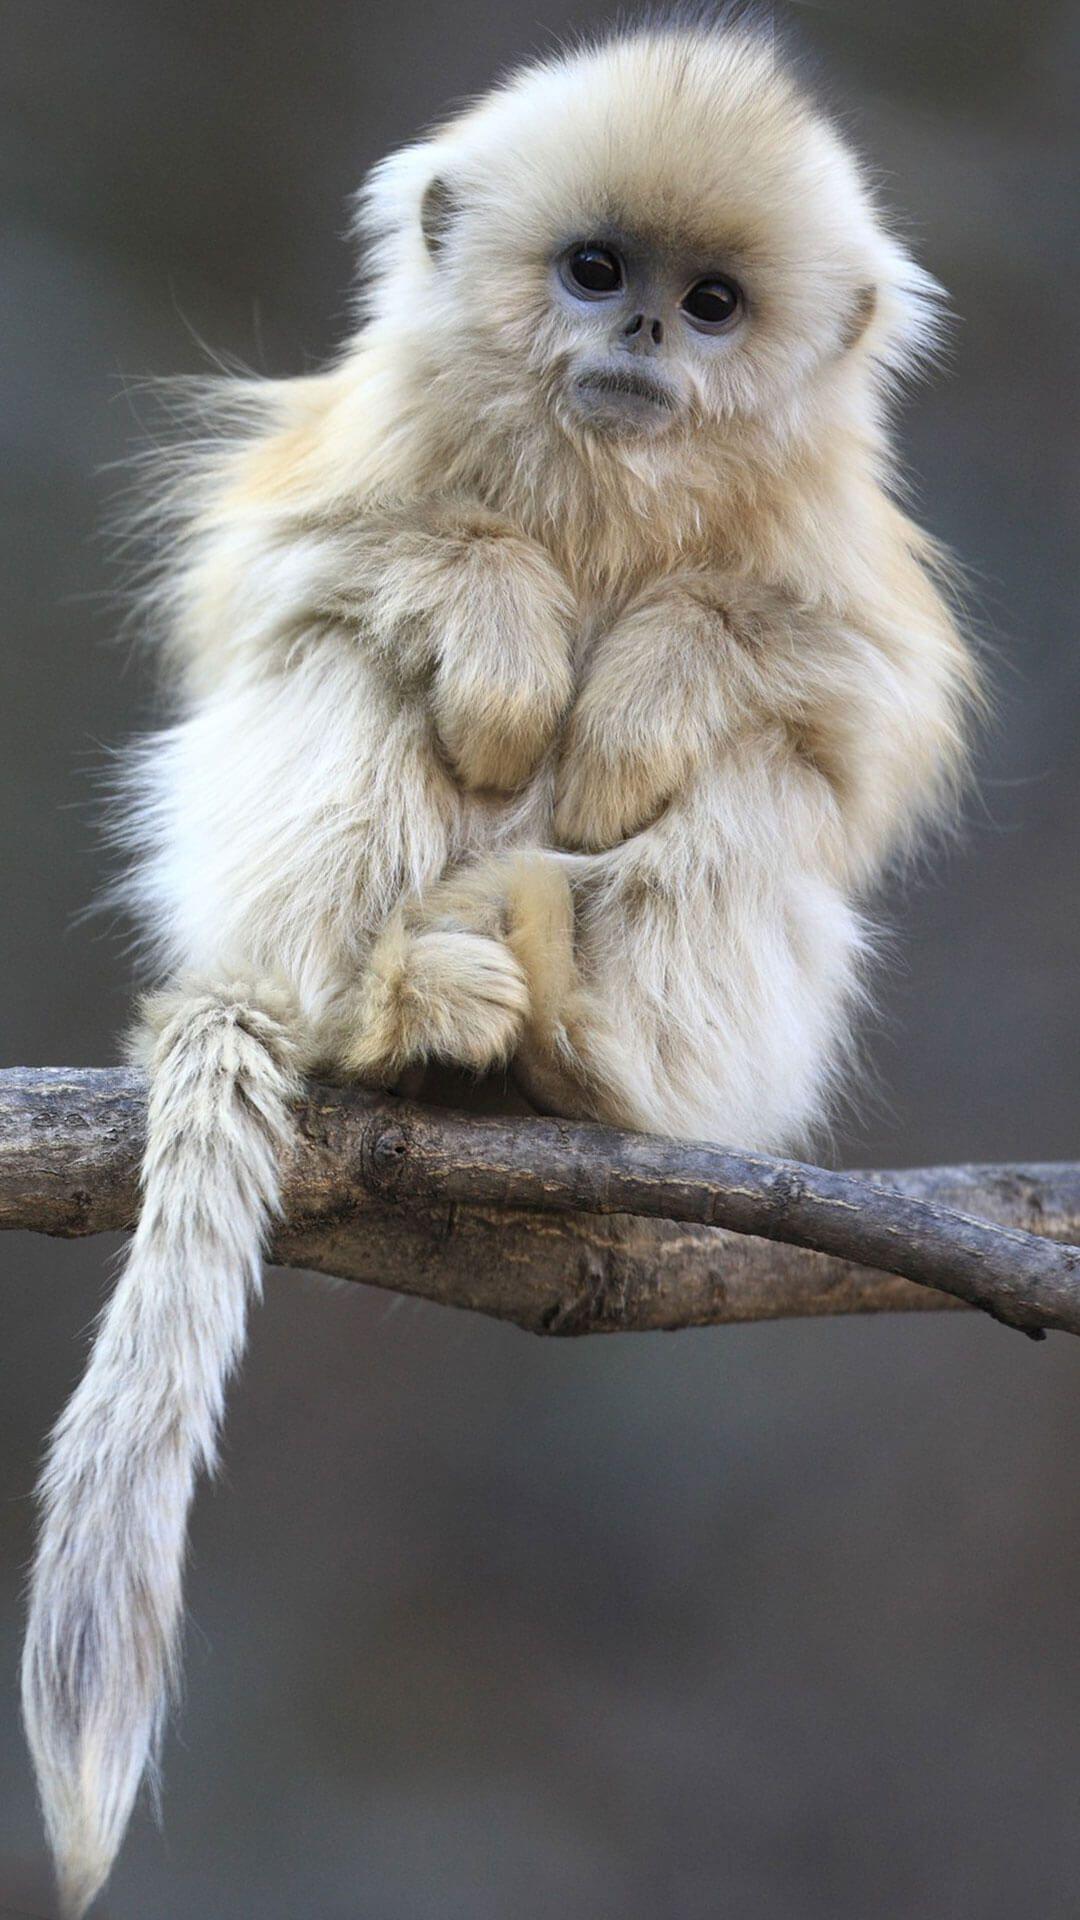 Cute Monkeys Wallpaper iPhone 6 HD Cute animals, Animals